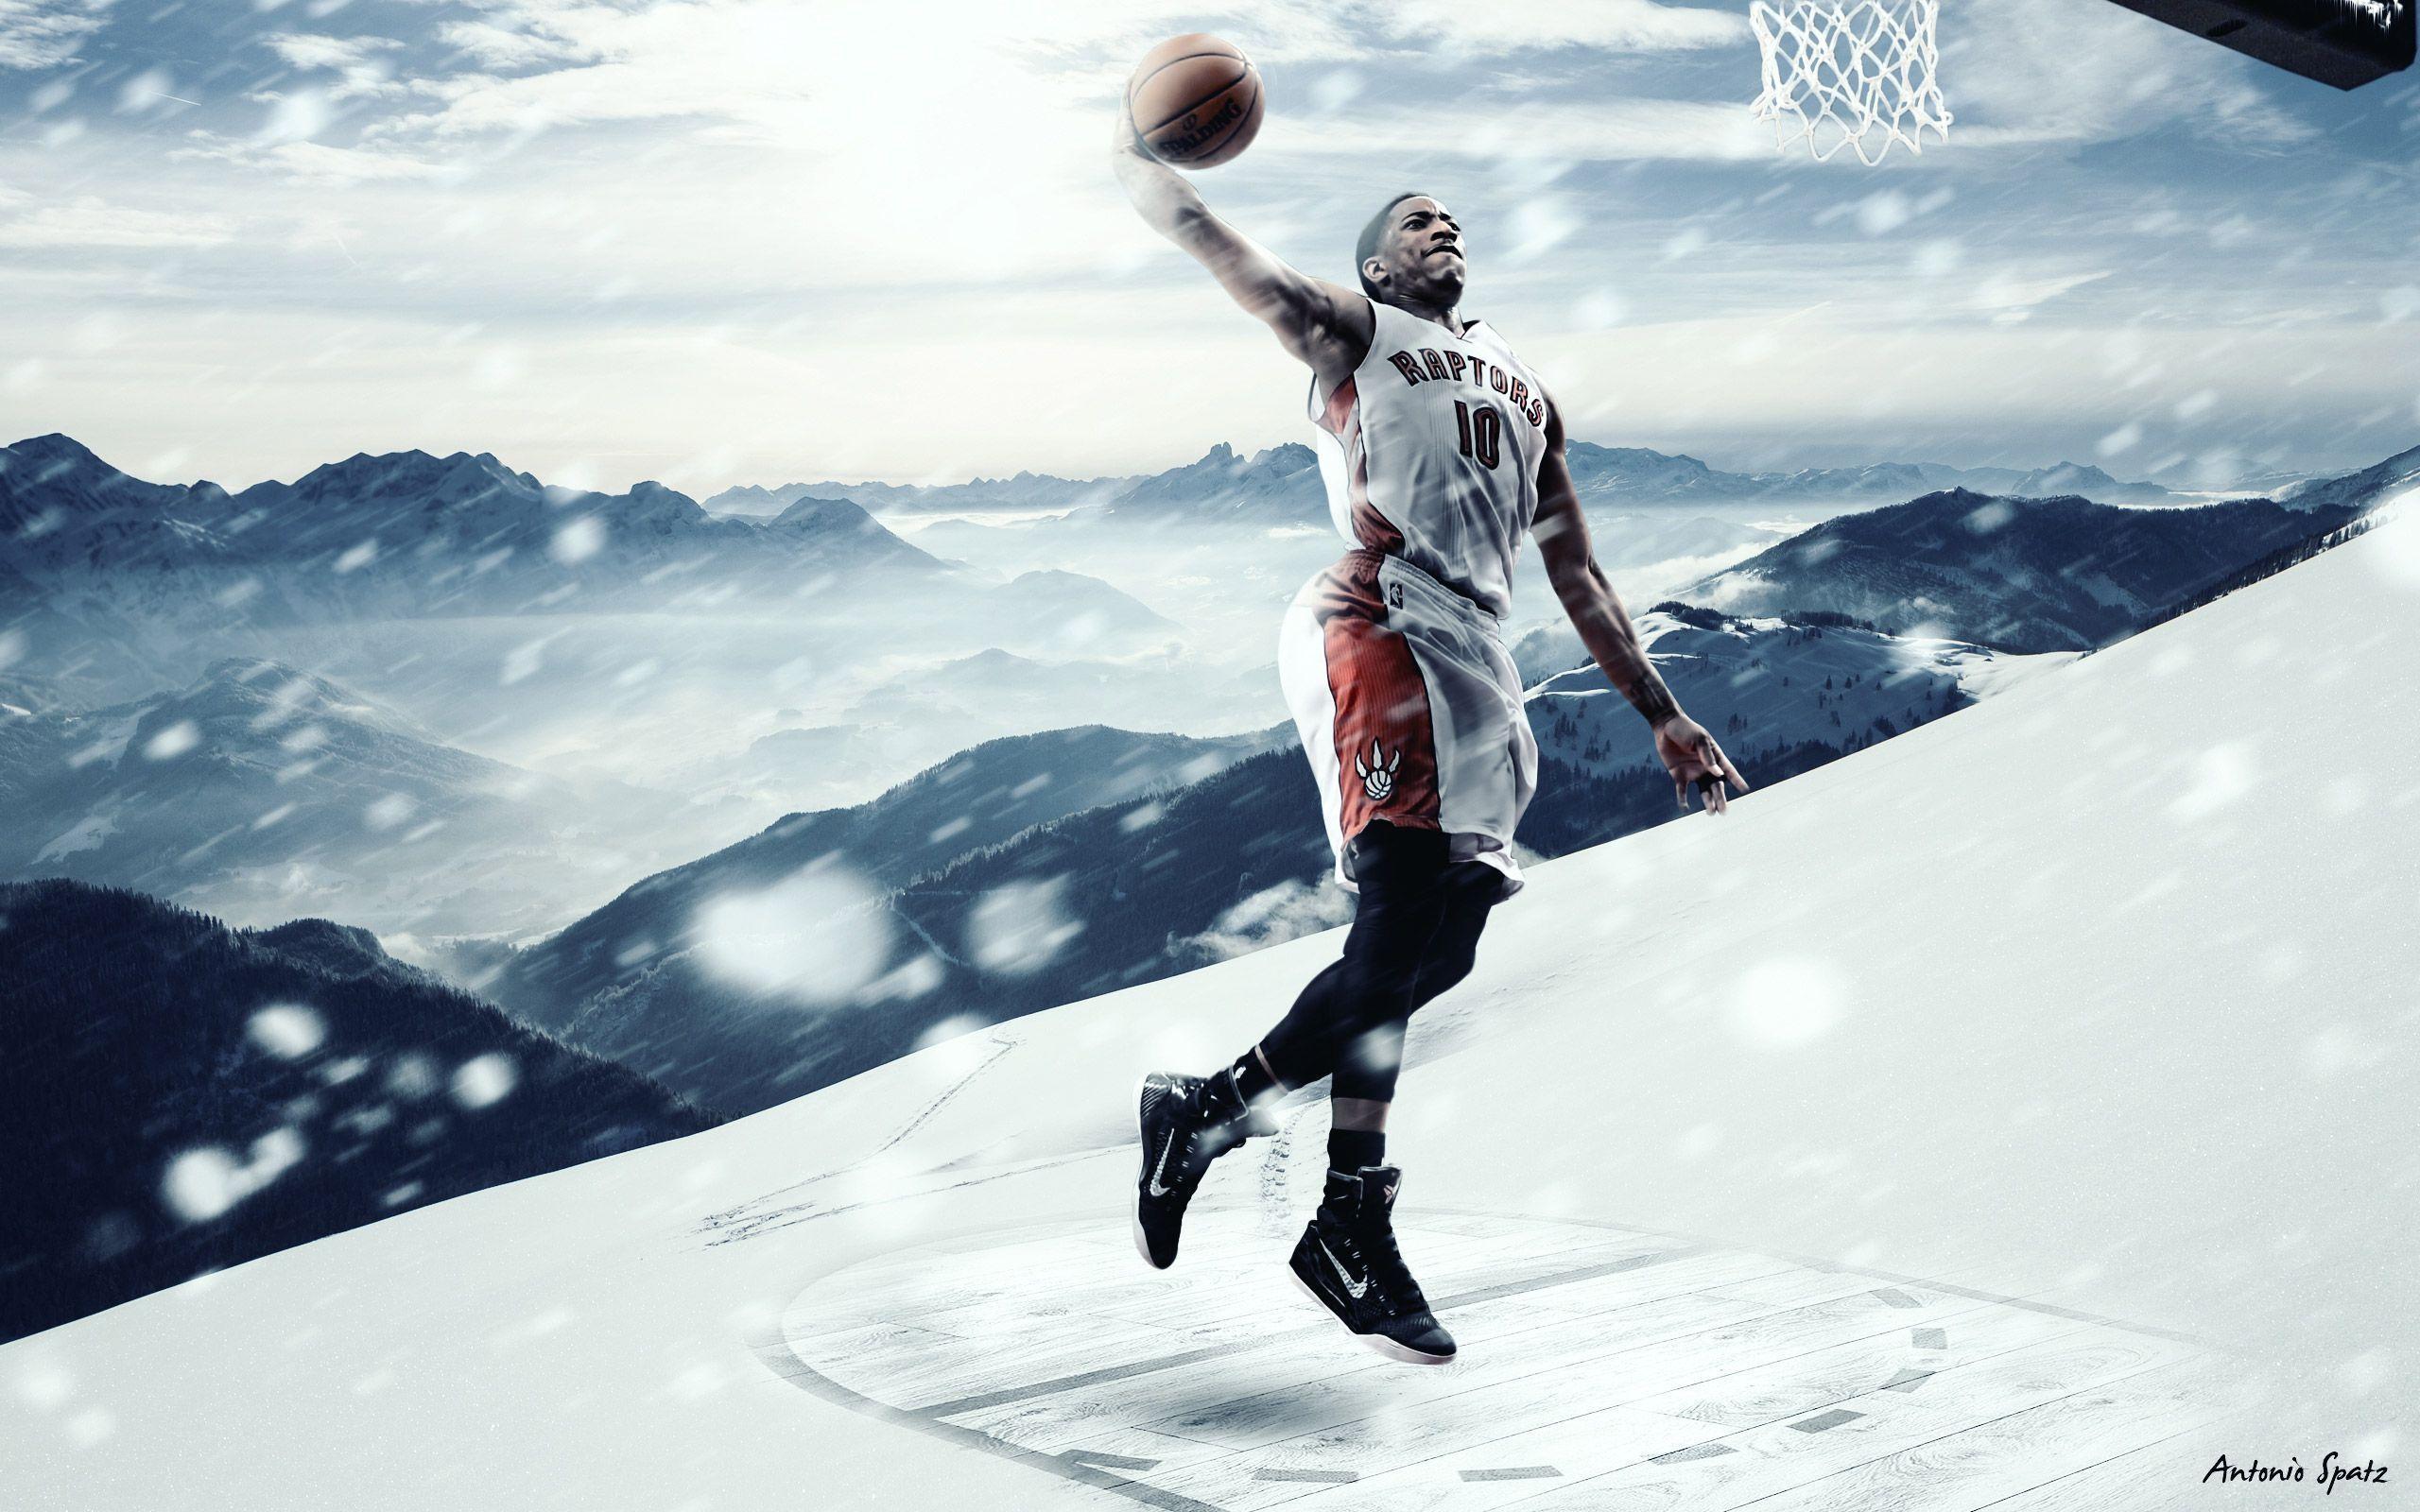 Toronto Raptors Wallpapers | Basketball Wallpapers at .